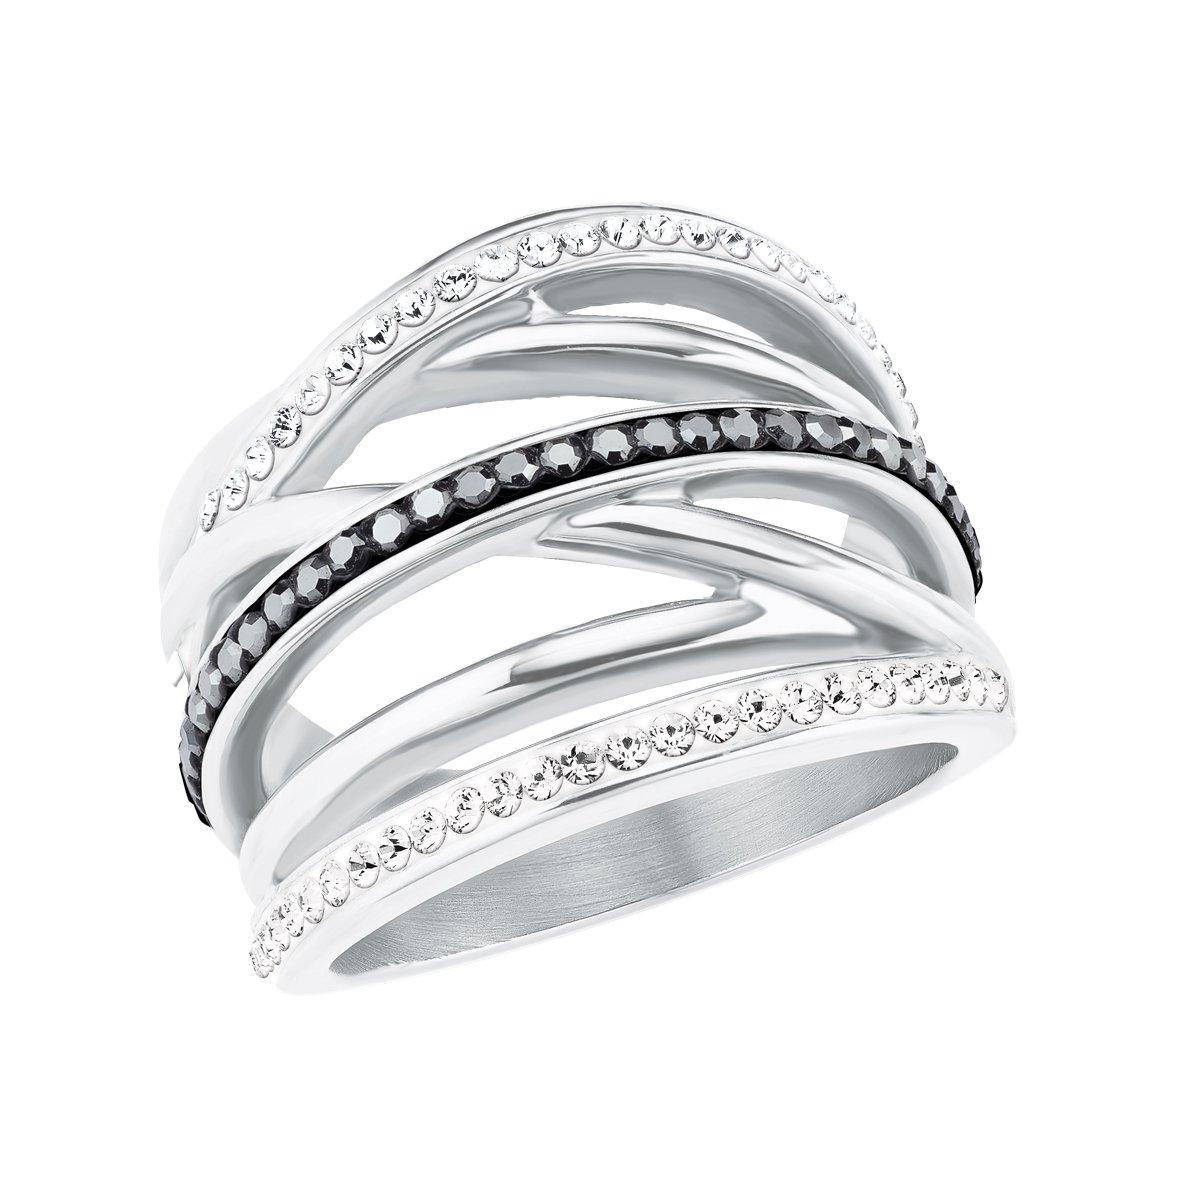 S.OLIVER Ringe günstig online kaufen • uhrcenter Schmuck Shop